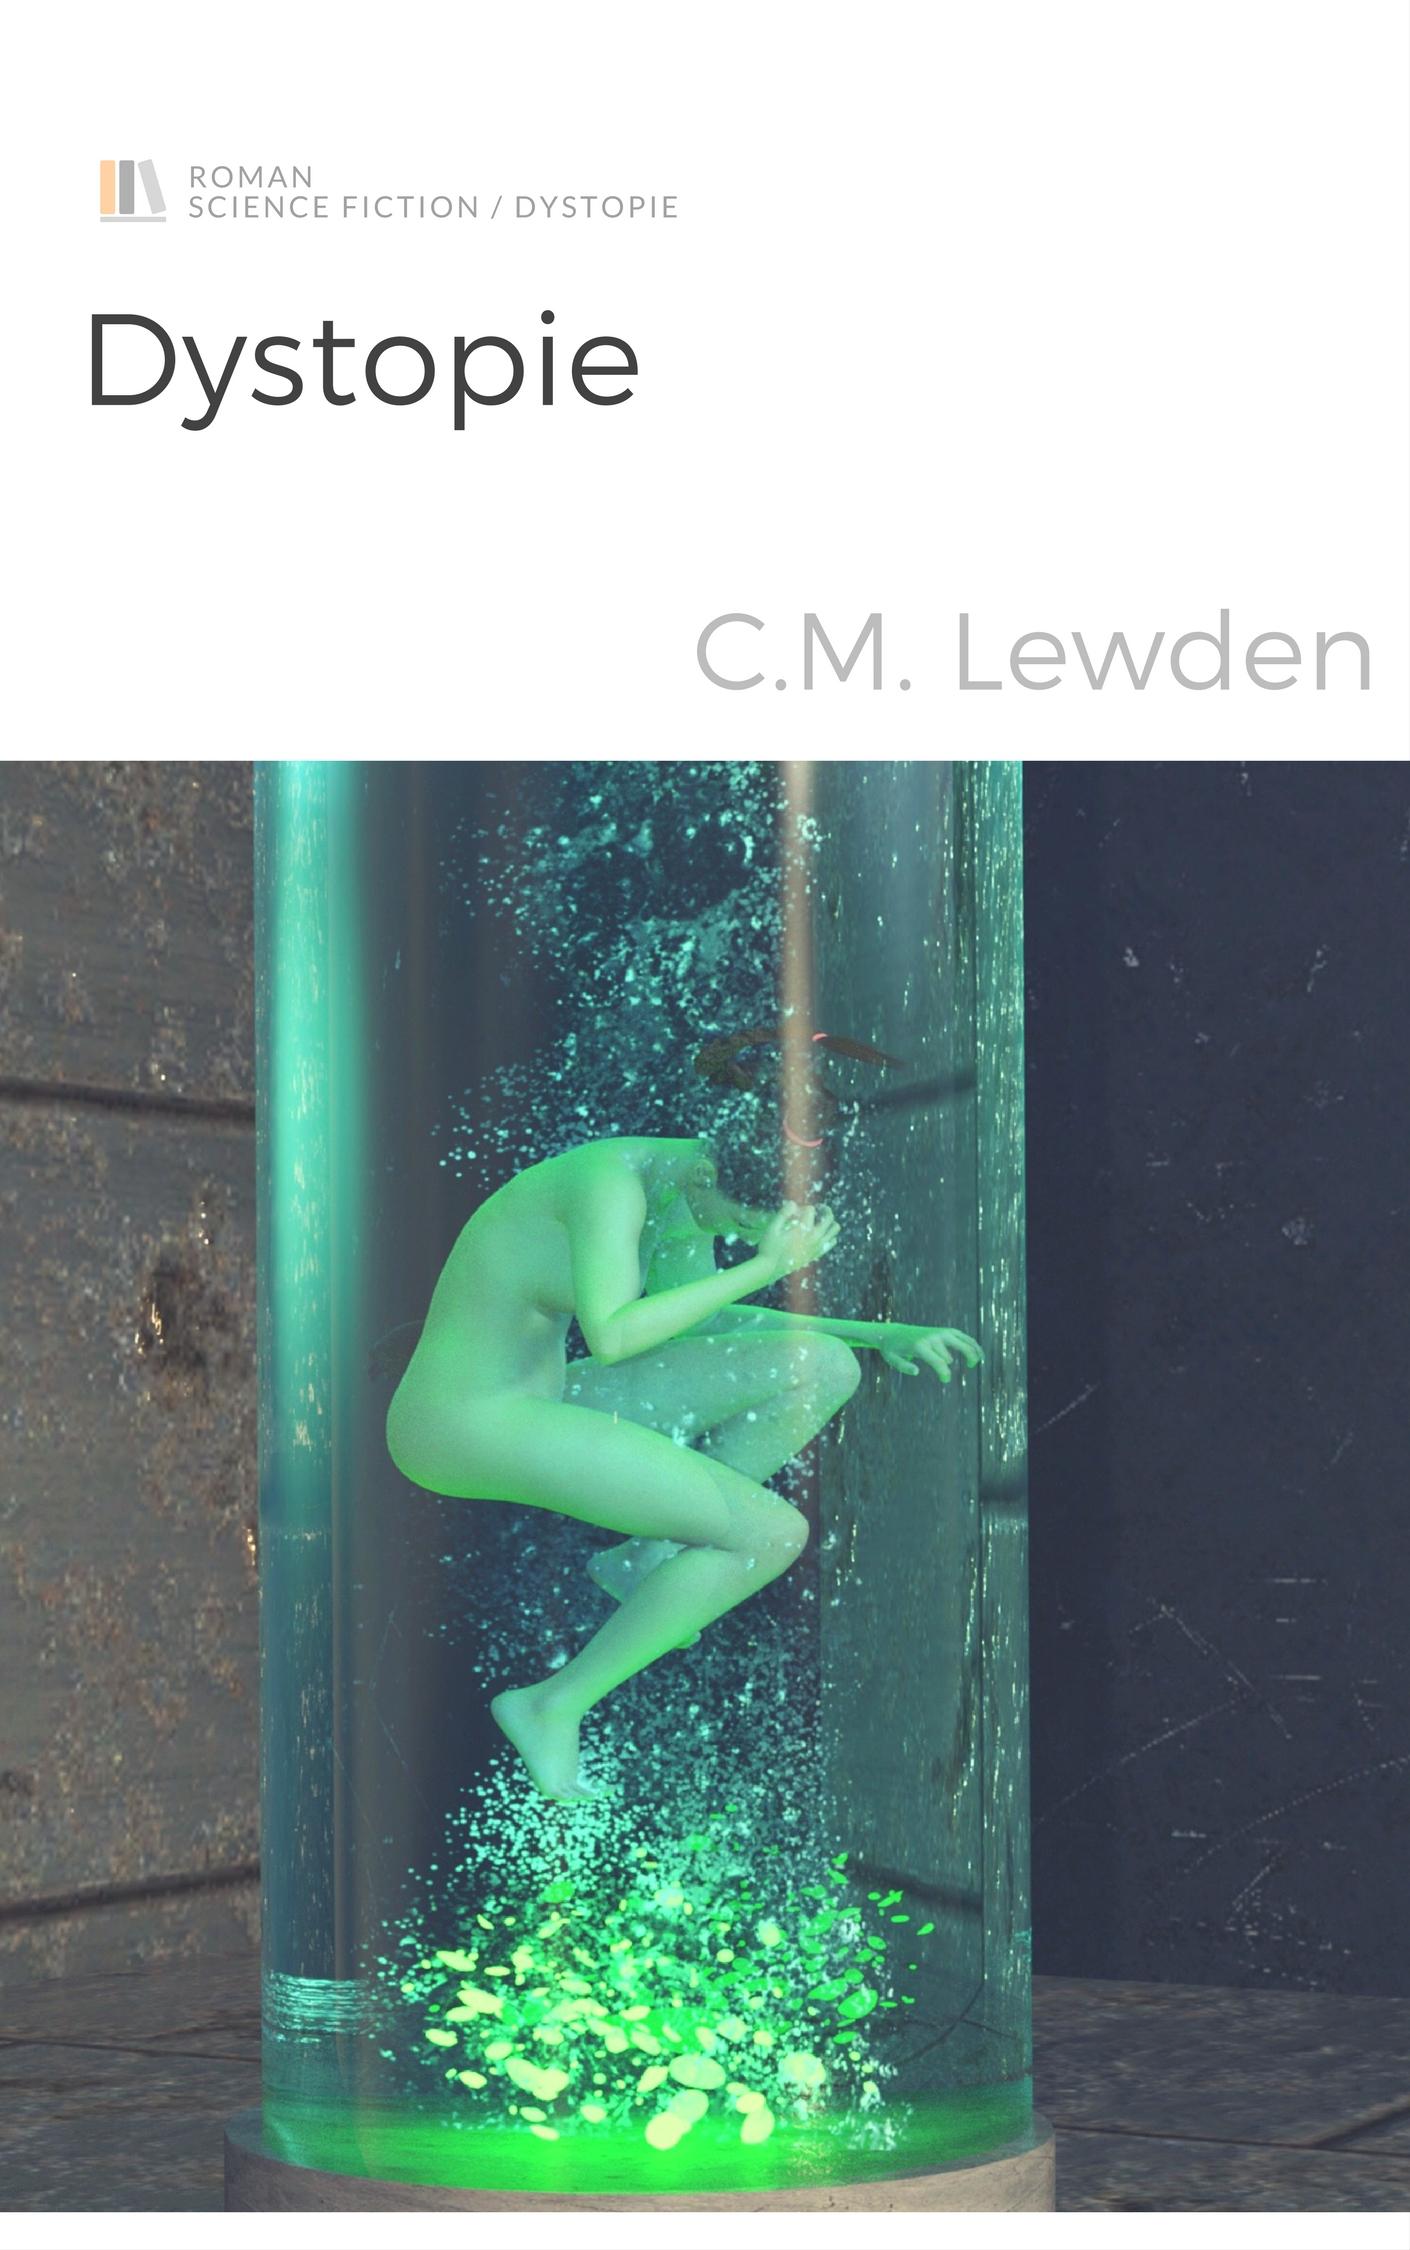 cover test - dystopie projet - c m lewden (image pixabay)